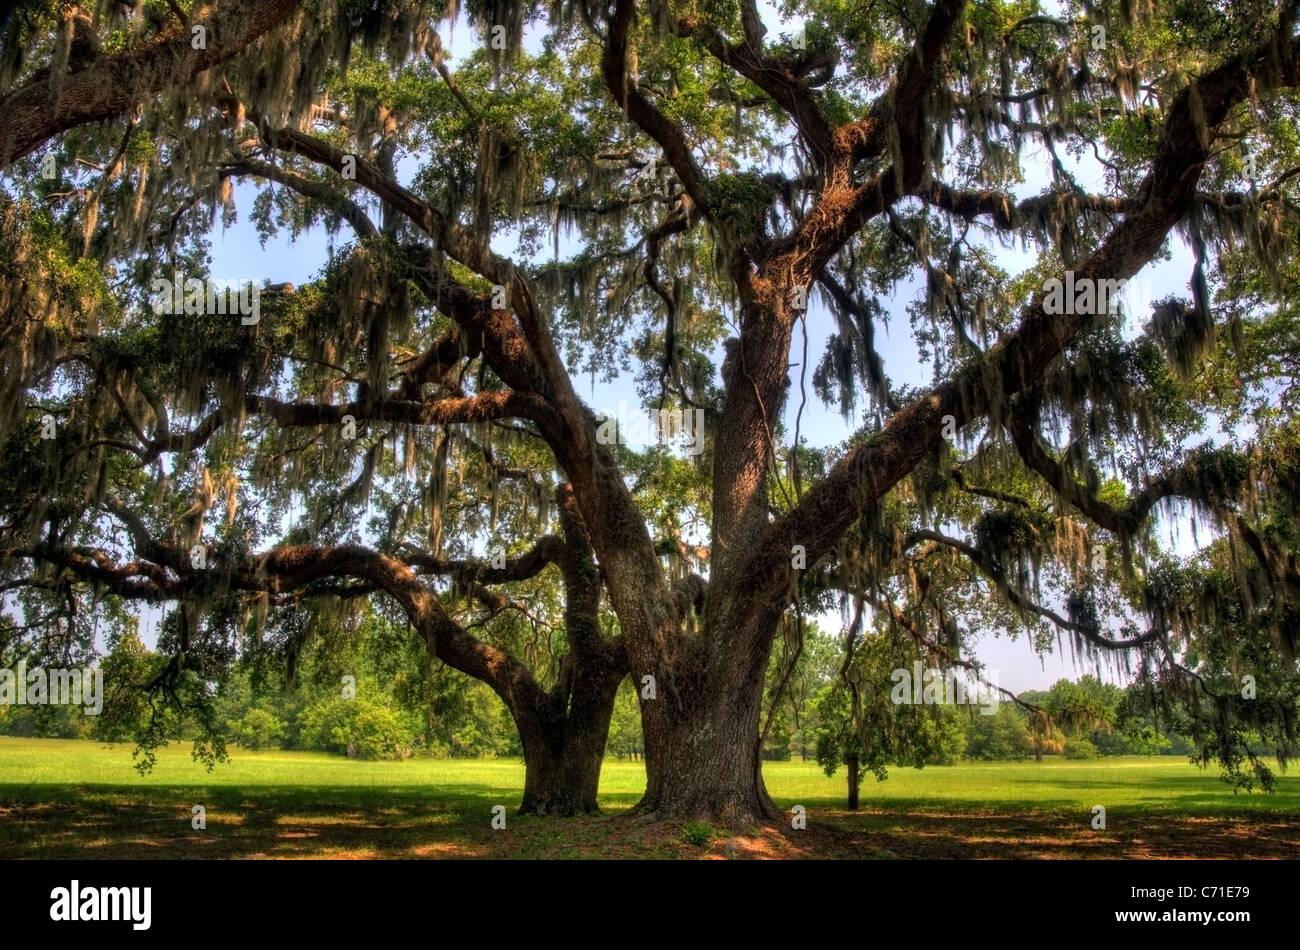 Huge live oak trees at Honey Horn Plantation on Hilton Head Island, South Carolina. - Stock Image